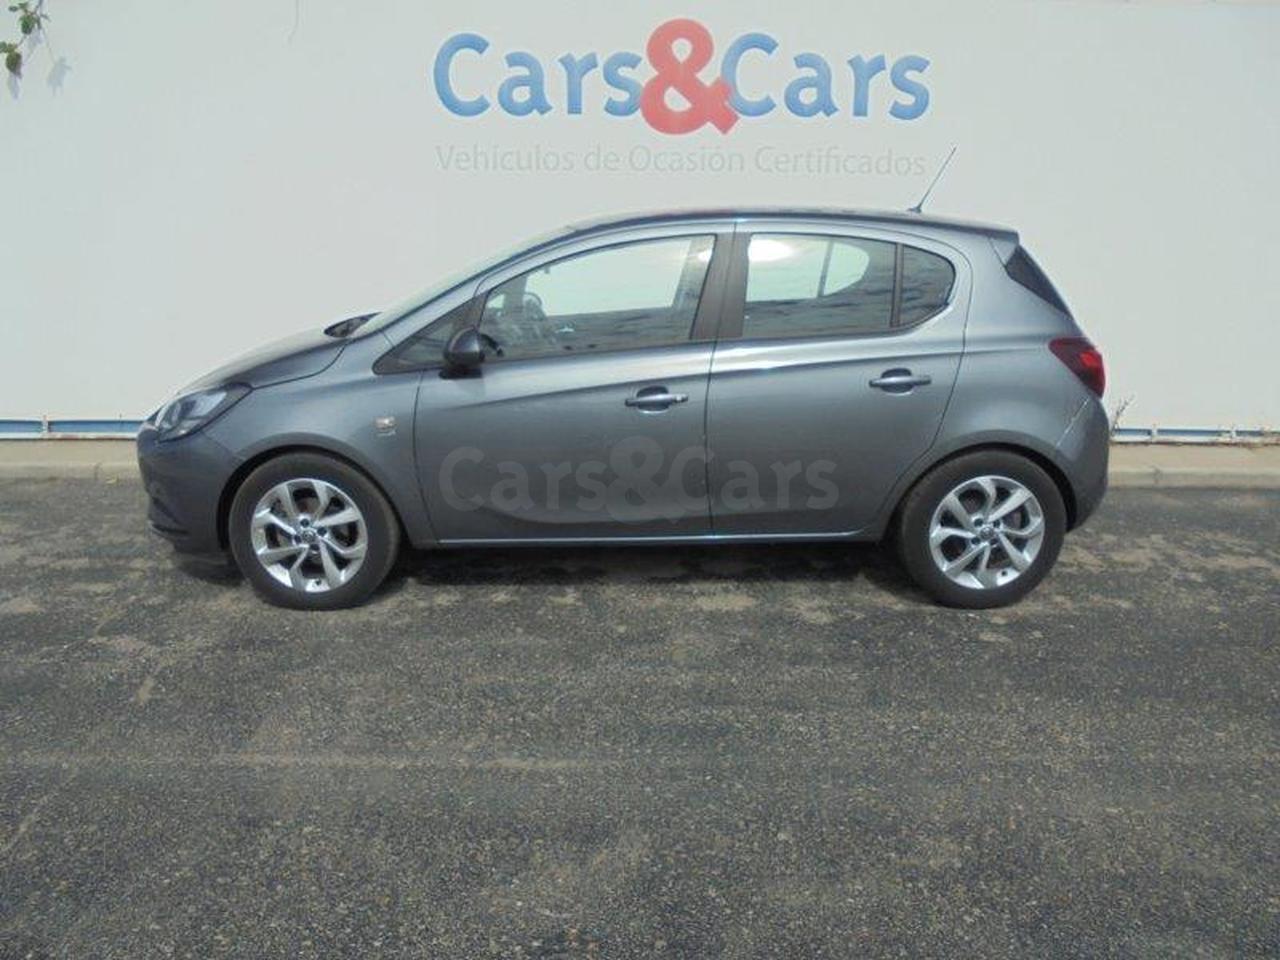 Opel Corsa ocasión segunda mano 2019 Gasolina por 10.495€ en Madrid